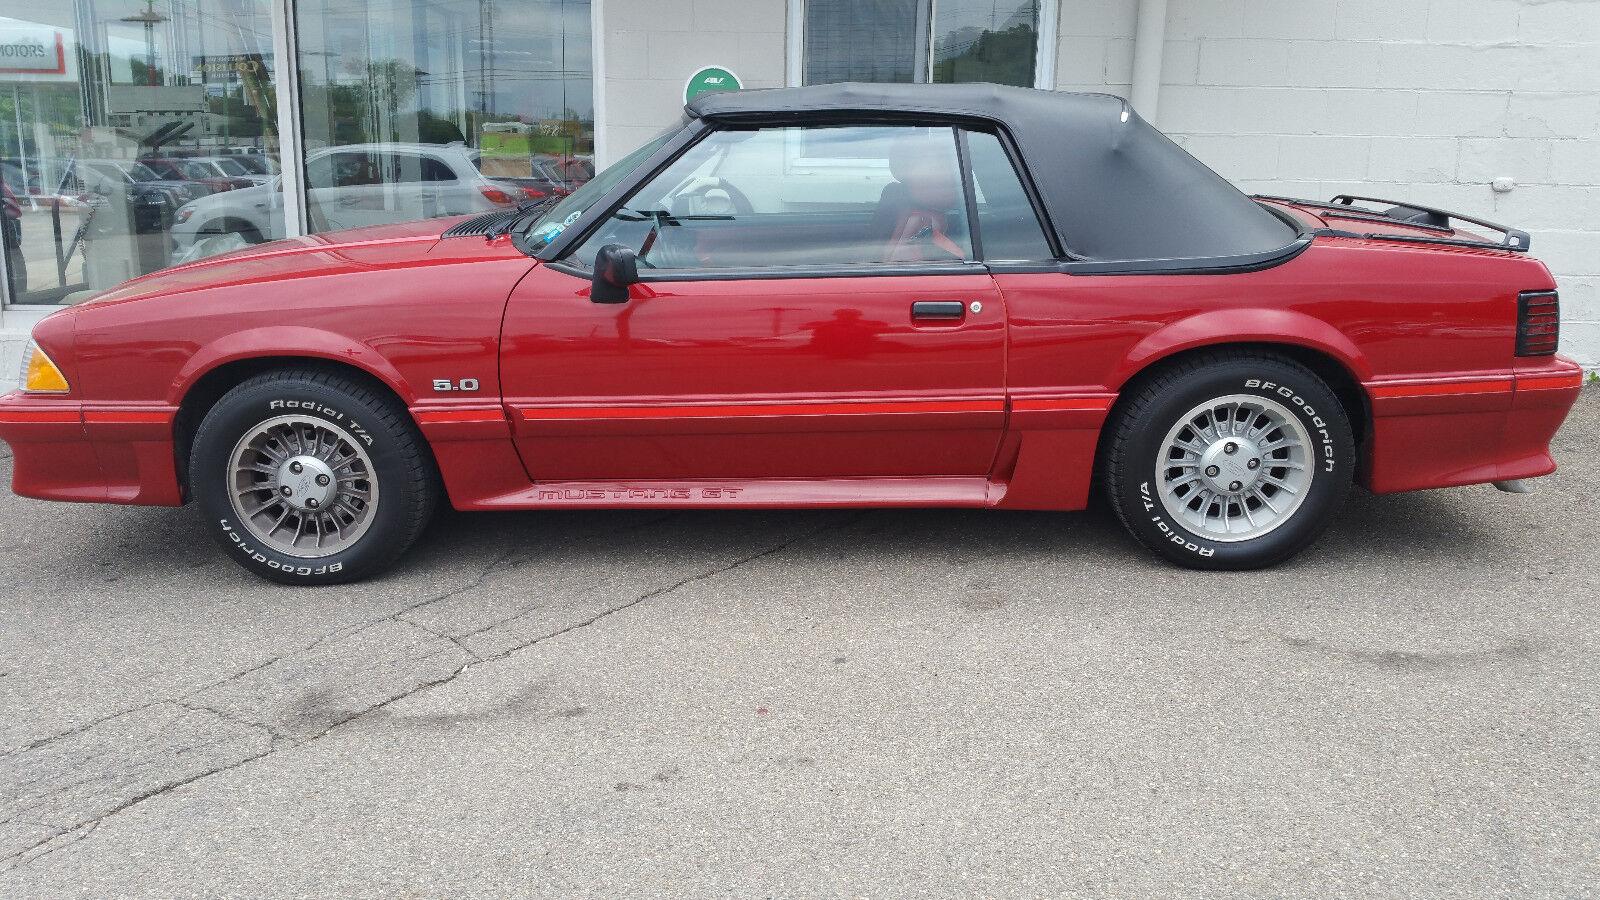 1988 ford mustang gt convertible 5 speed 57 000 original. Black Bedroom Furniture Sets. Home Design Ideas